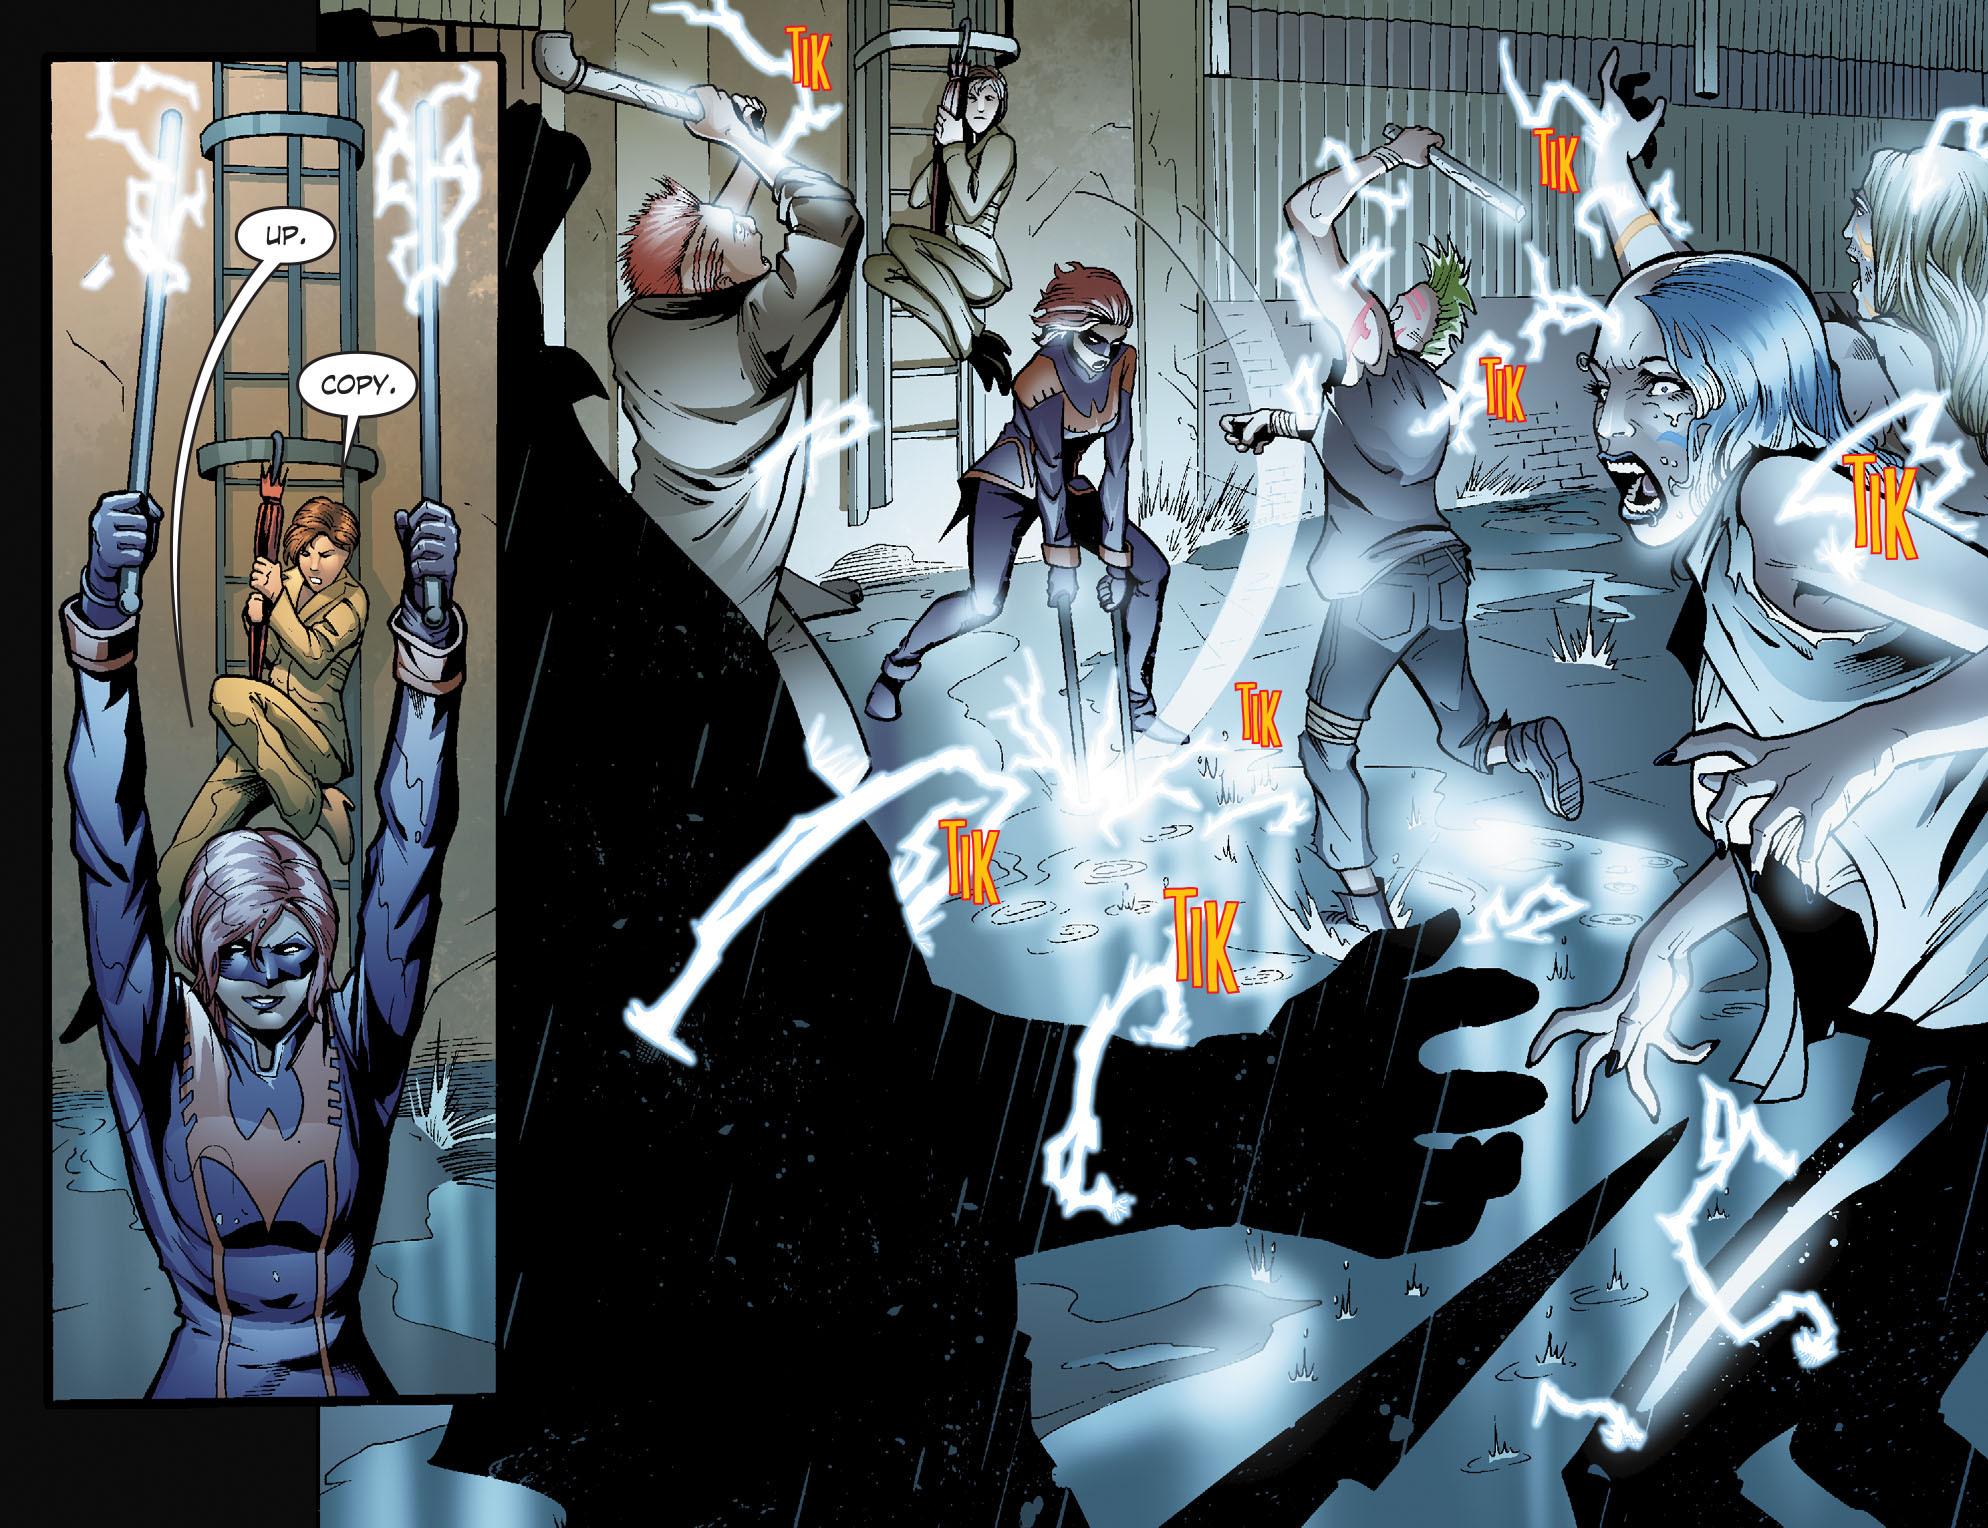 Read online Smallville: Alien comic -  Issue #8 - 10